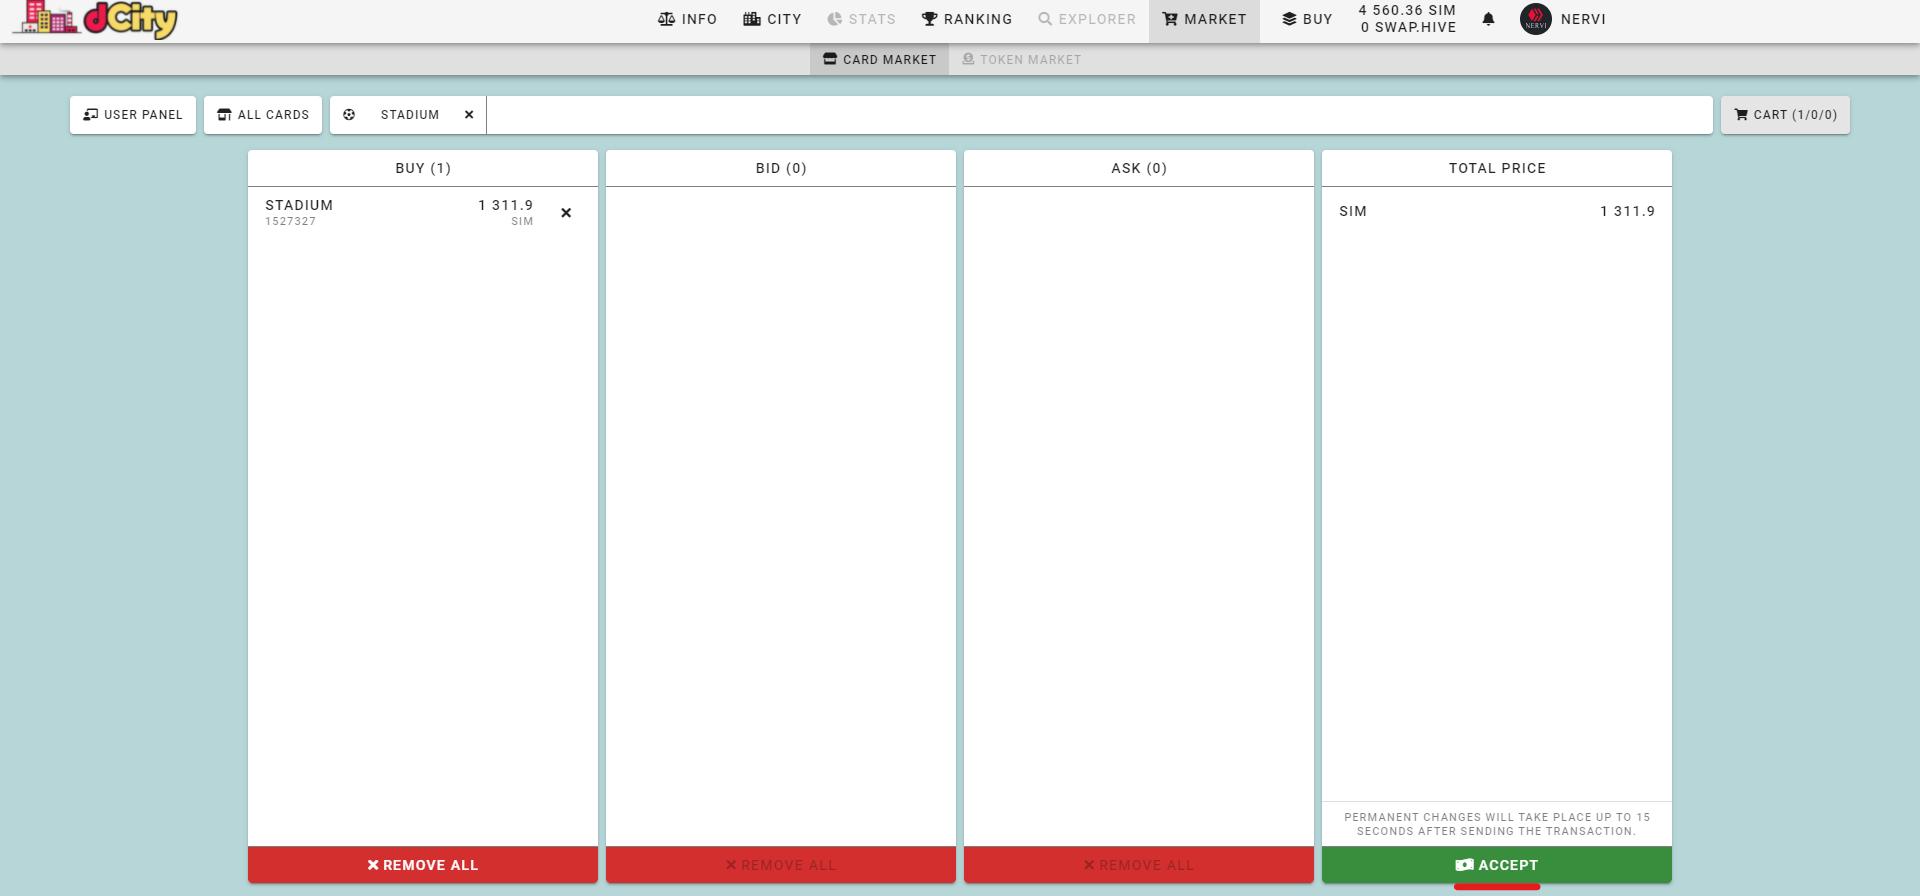 Zrzut ekranu 20210510 140909.png